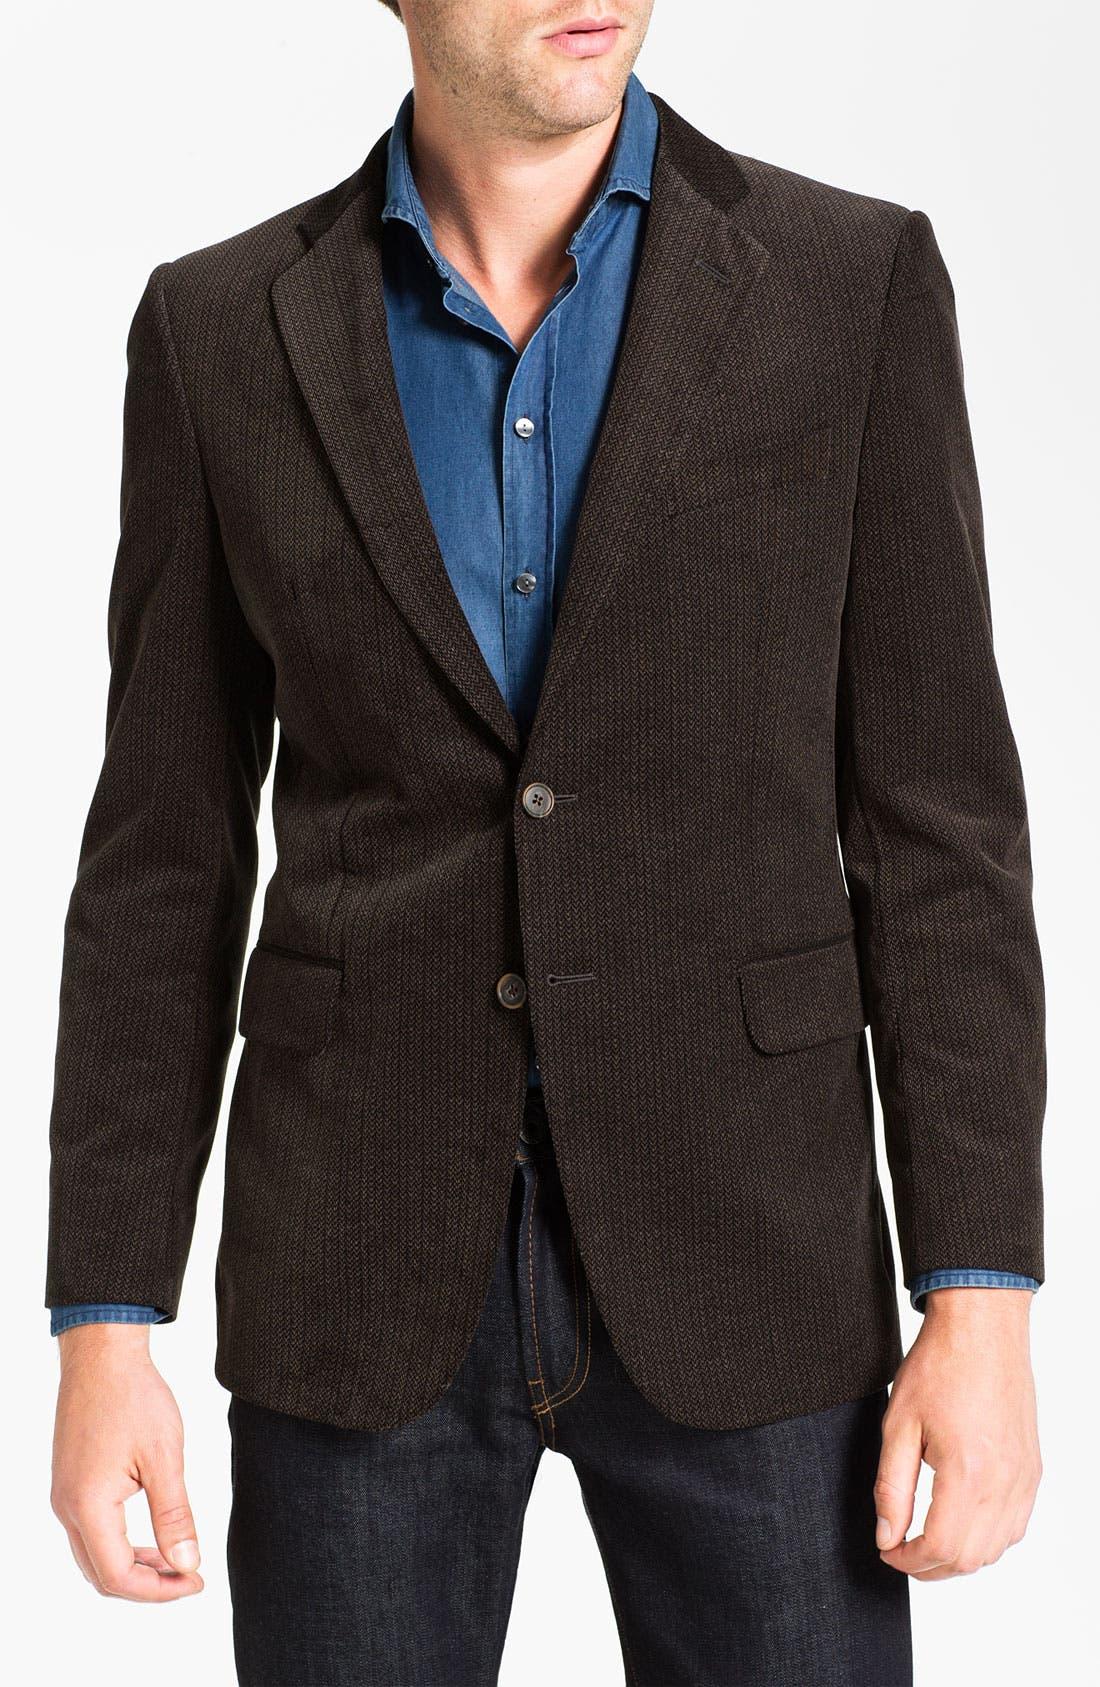 Alternate Image 1 Selected - Joseph Abboud Herringbone Cotton Sportcoat